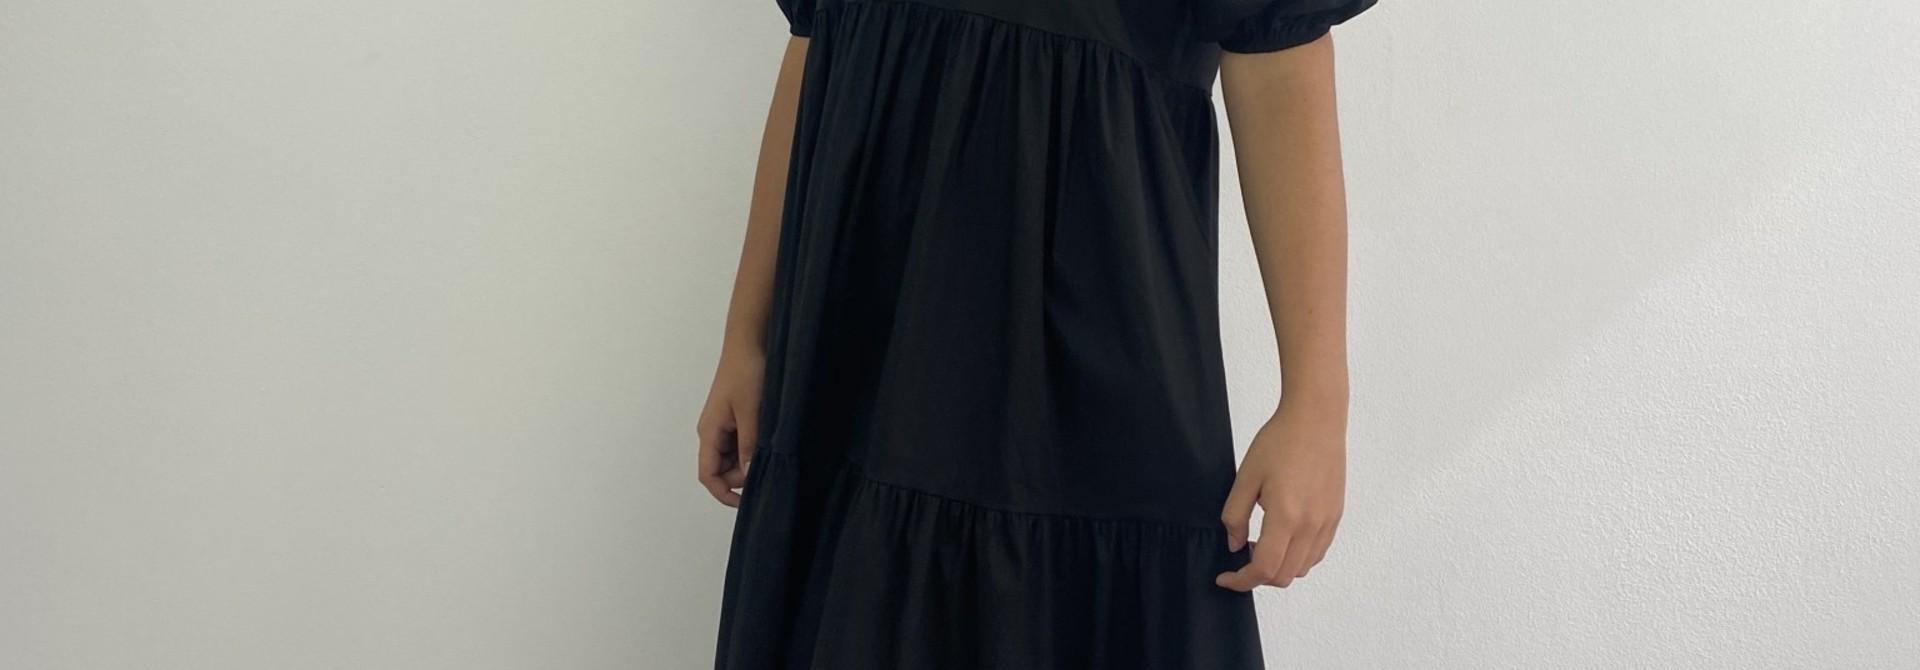 Jovie urban dress Black